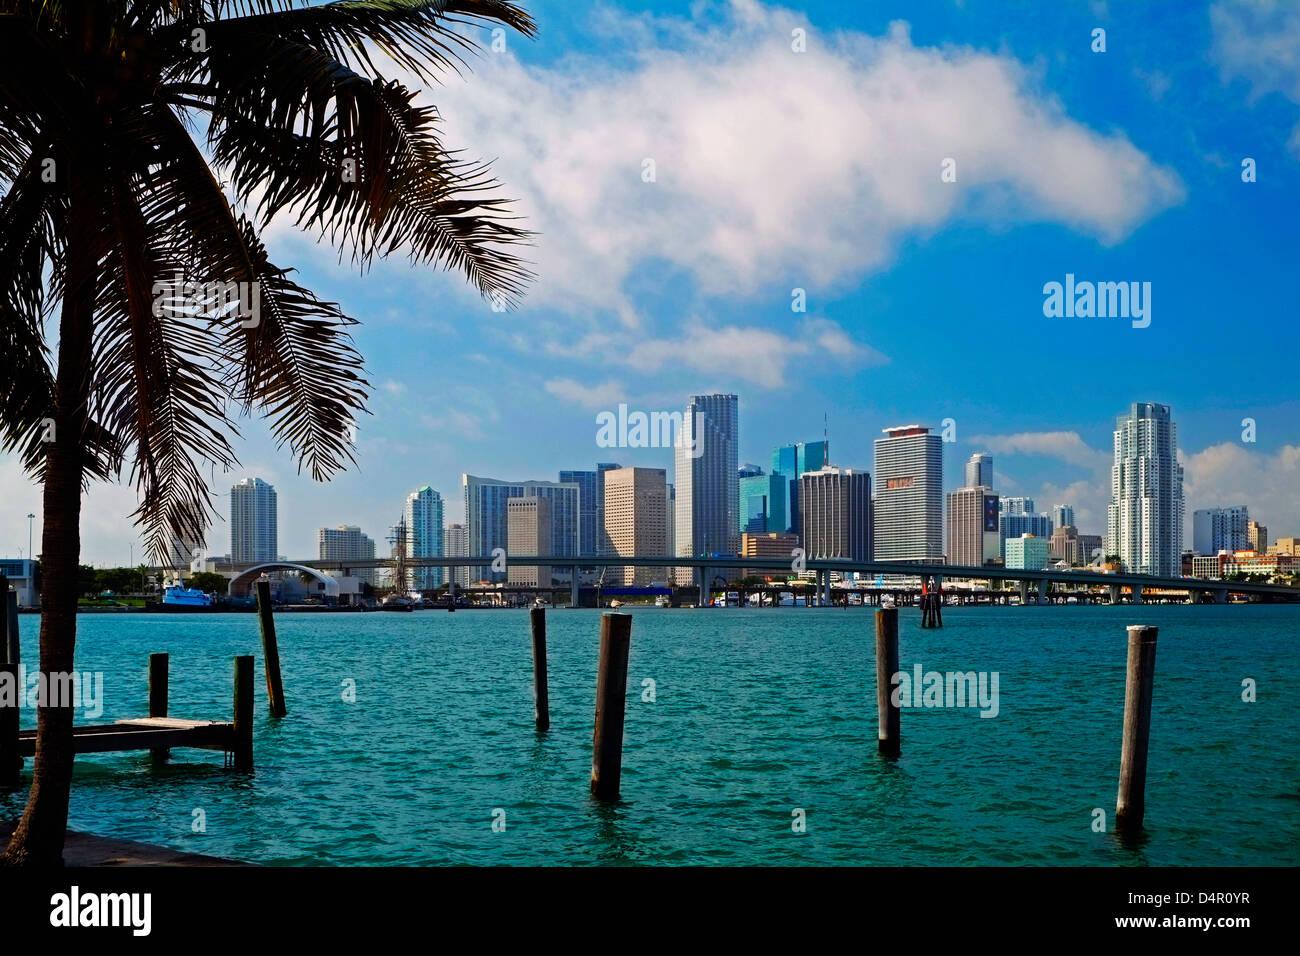 La ville de Miami, Floride Photo Stock